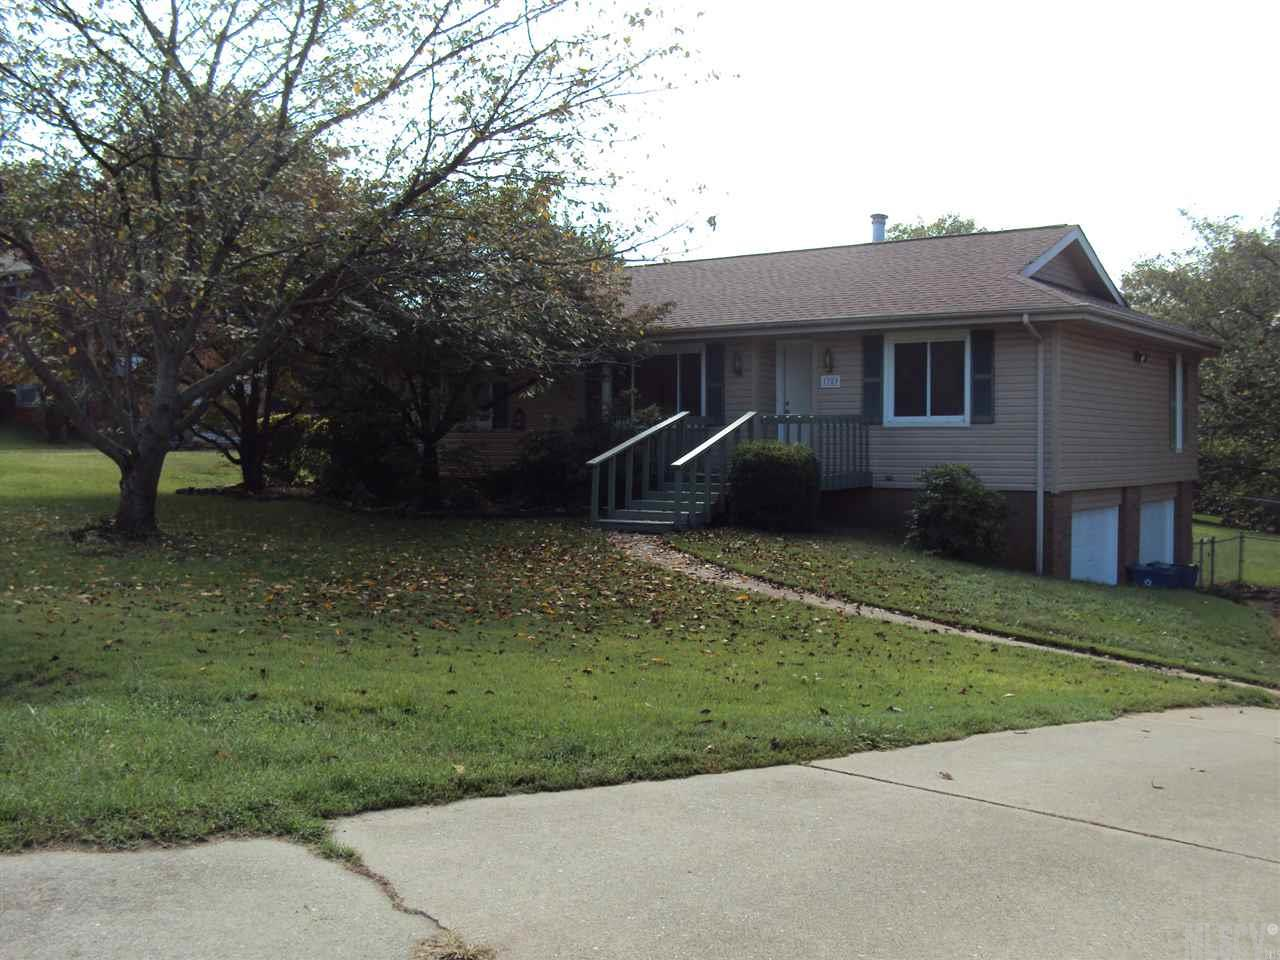 1789 Woodridge Cir, Hickory, NC 28602